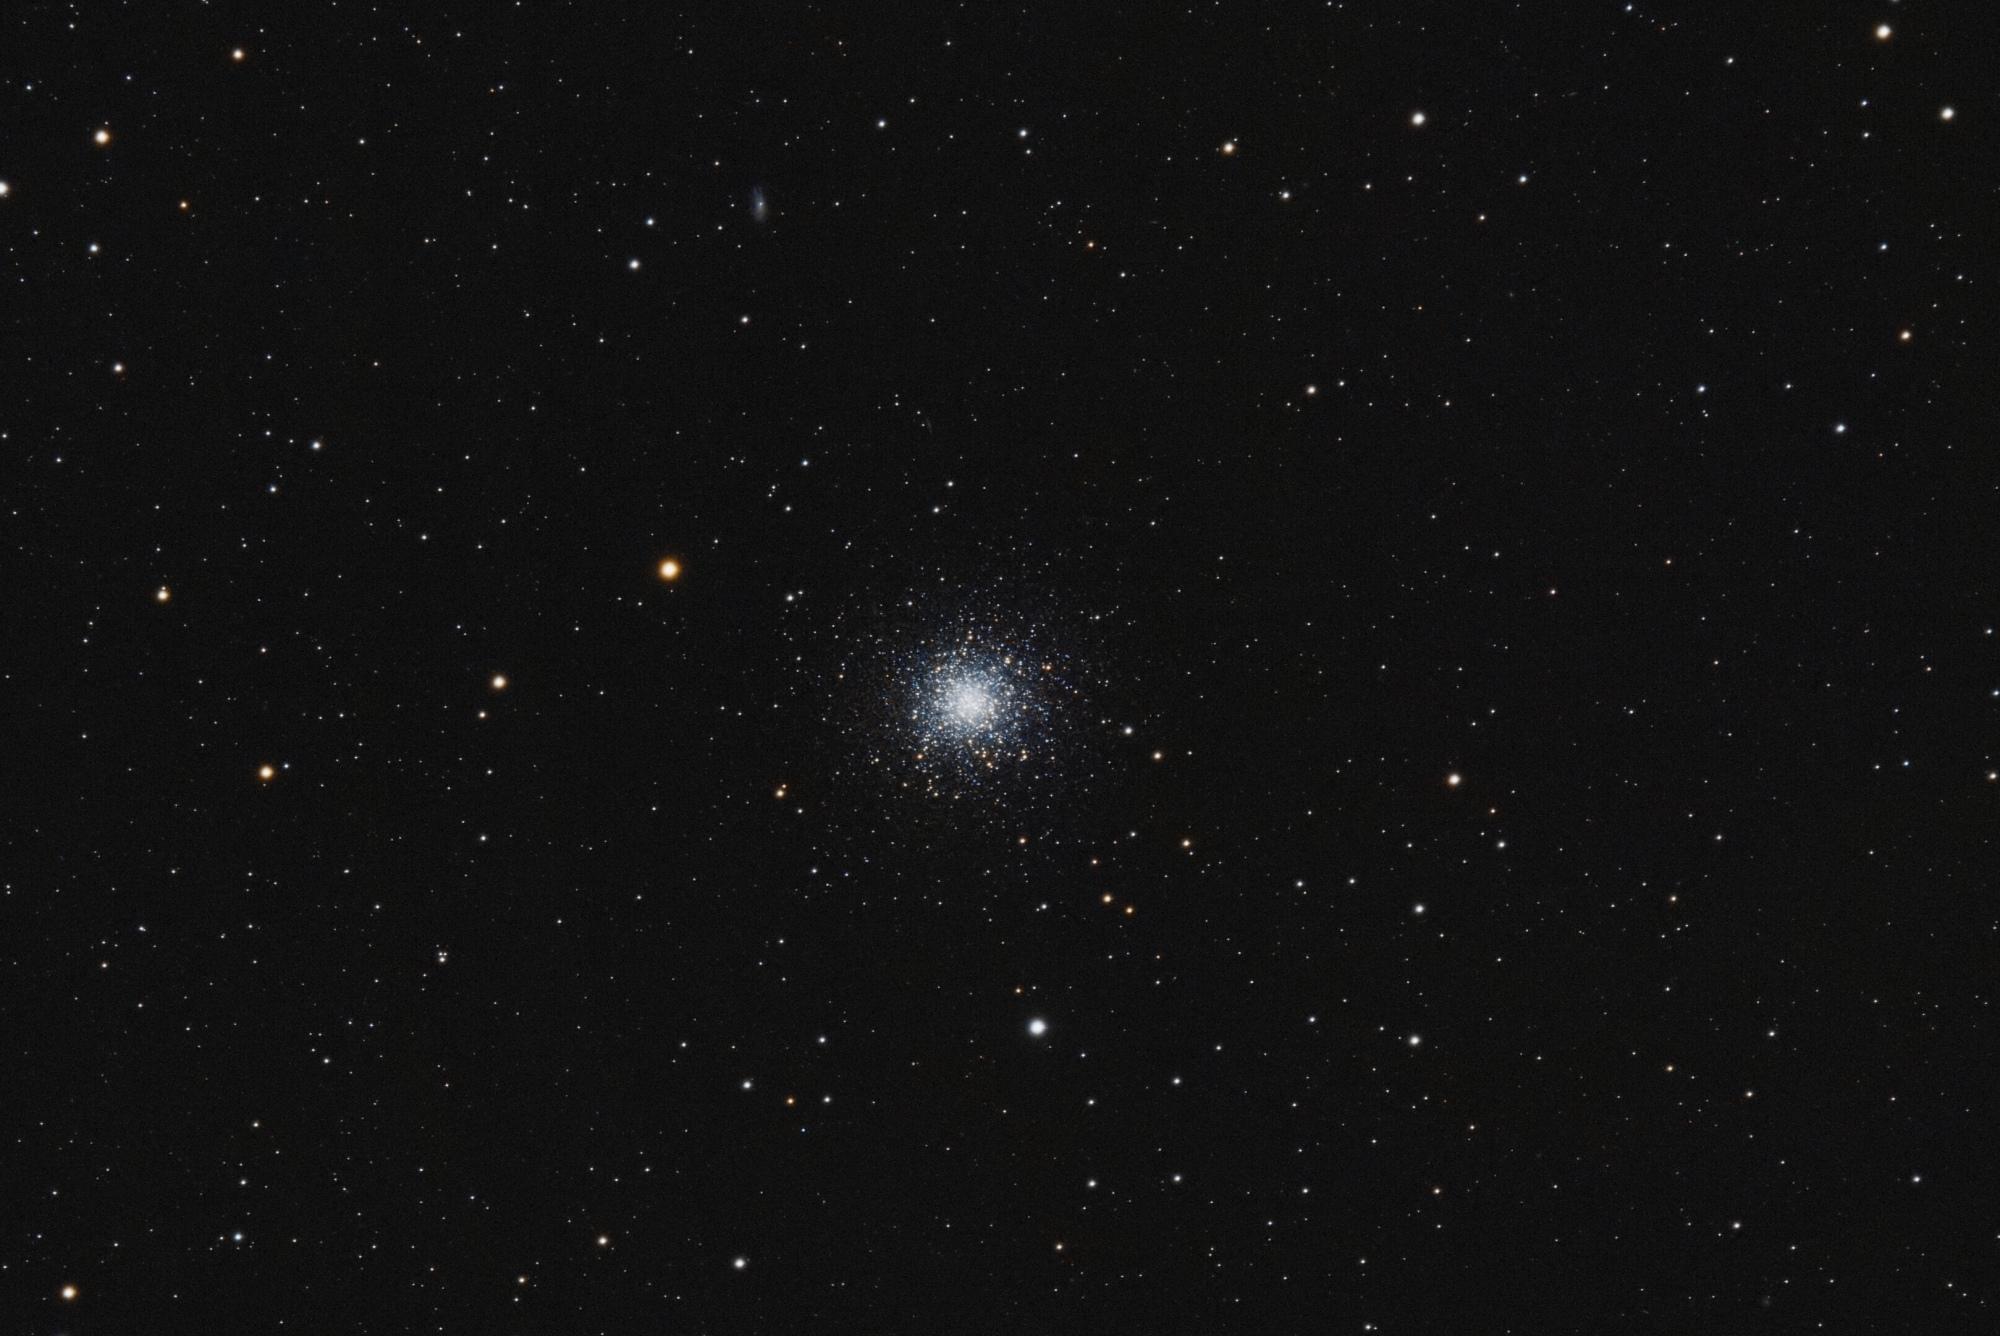 astro_M13.jpg.69819b289a57bb55d11890bea0736700.jpg